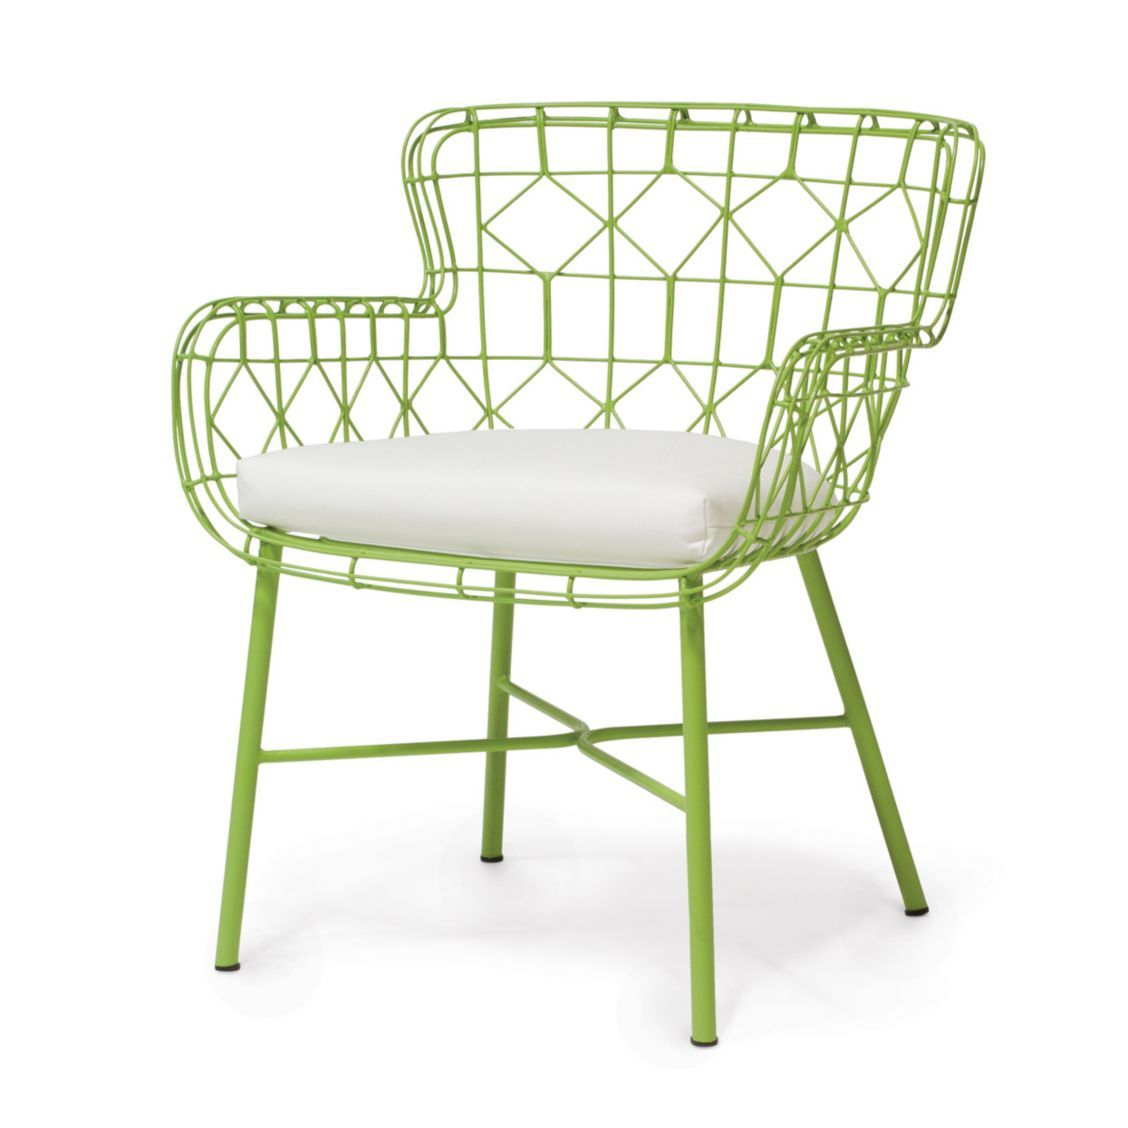 #luxelikes: Capri Outdoor Arm Chair by Palecek | http://www. - Luxelikes: Capri Outdoor Arm Chair By Palecek Http://www